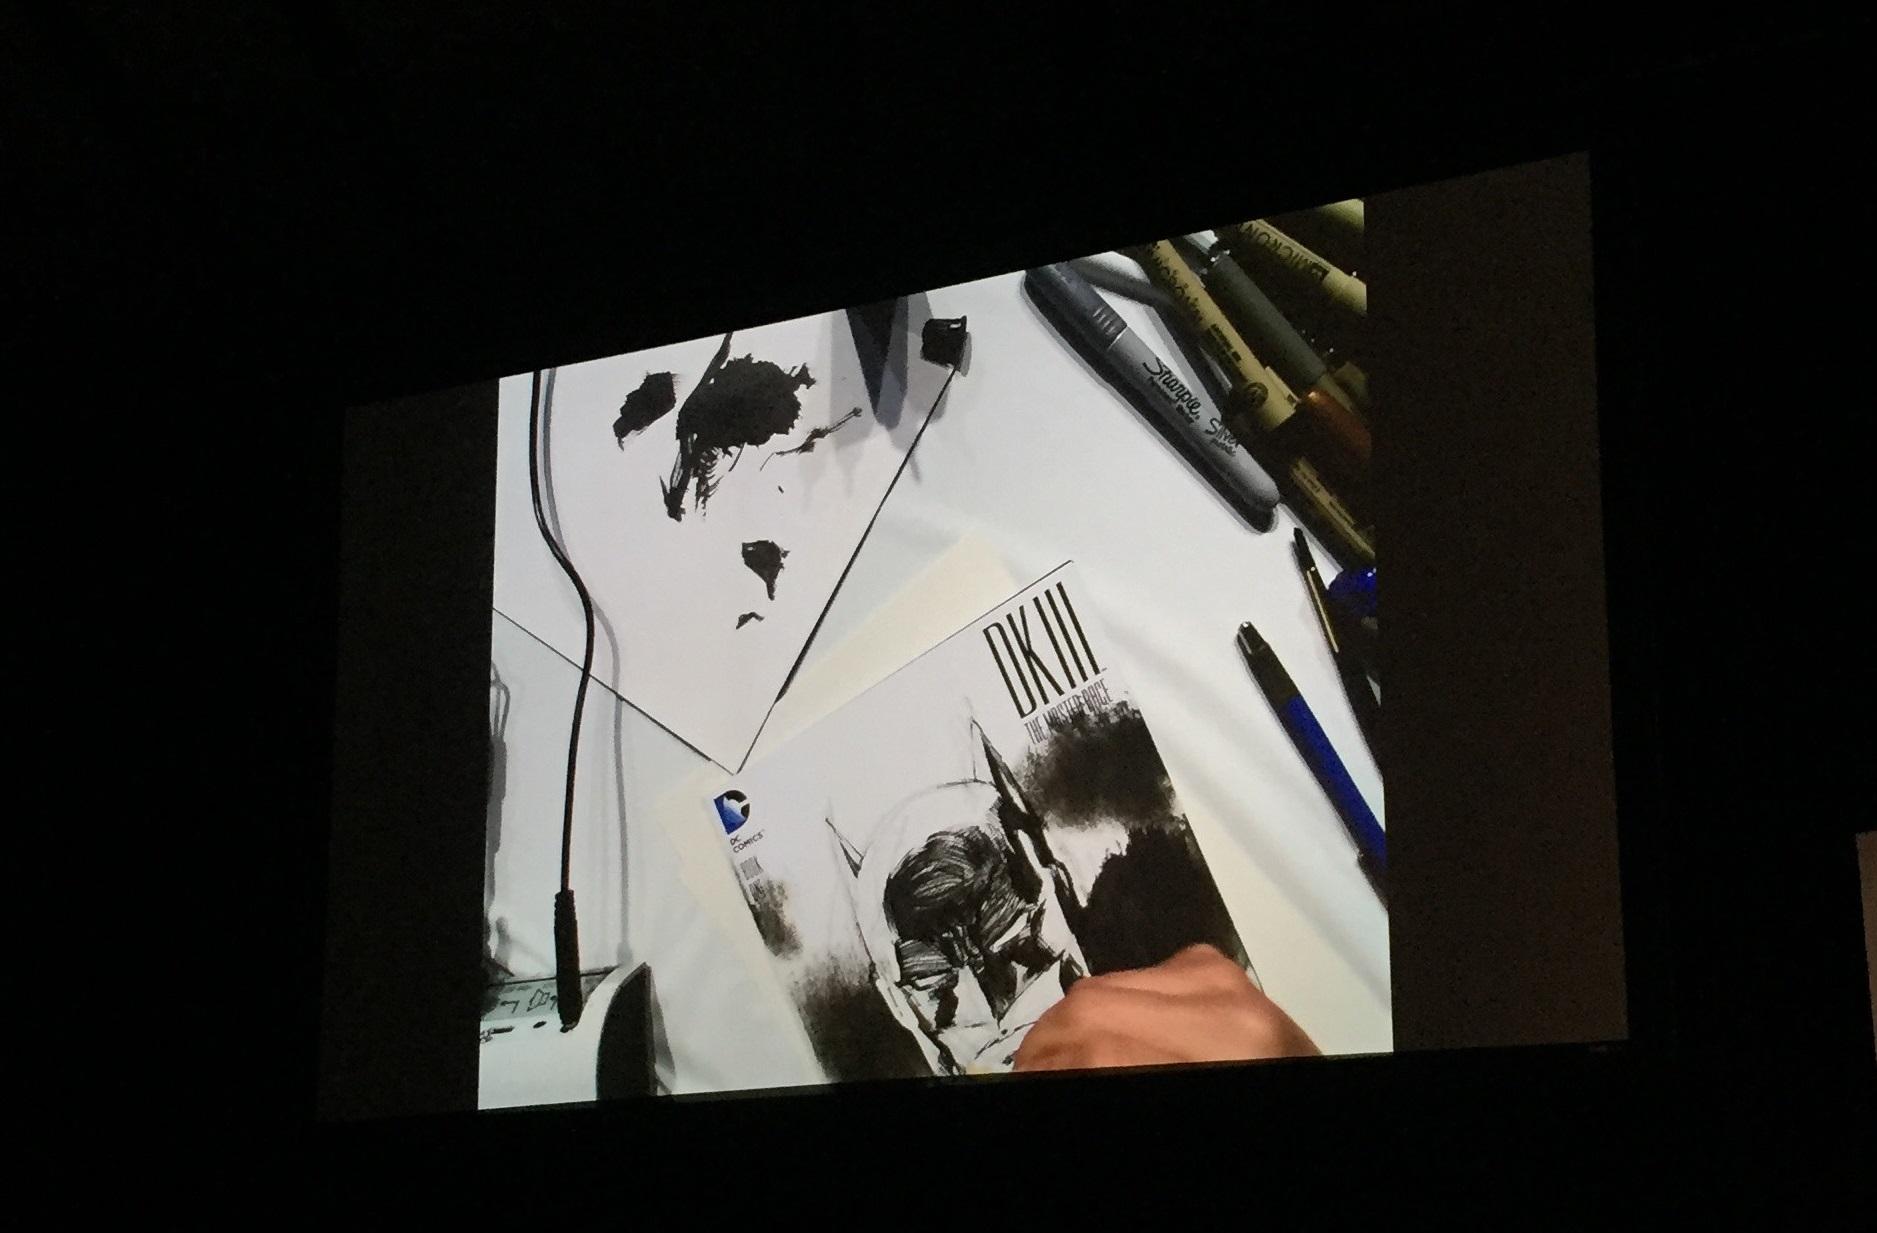 Jim lee drawing during Spotlight Panel